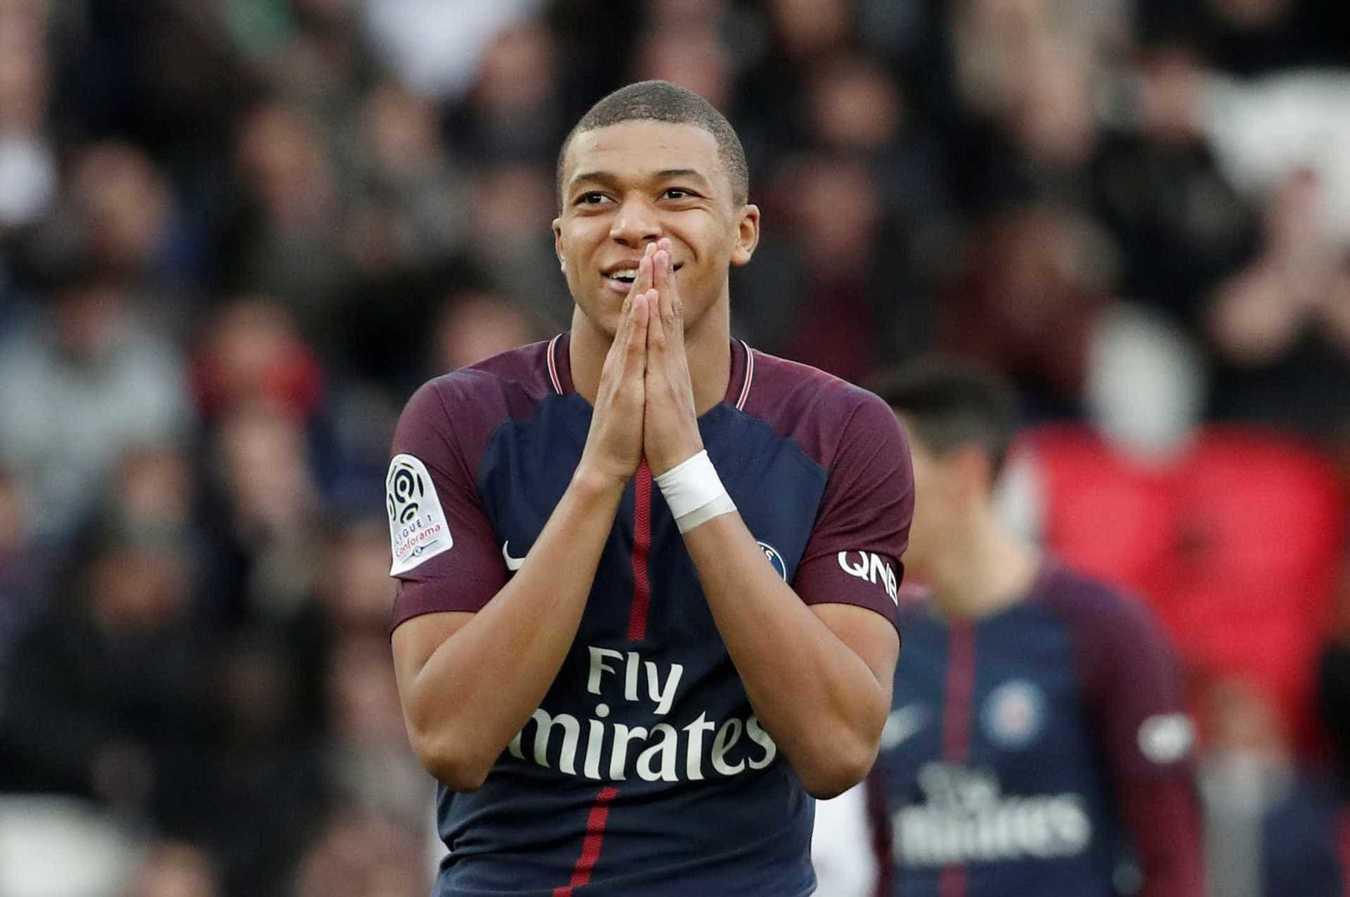 4º Kylian Mbappé, PSG: 133,8 milhões de euros -> 188,5 milhões de euros